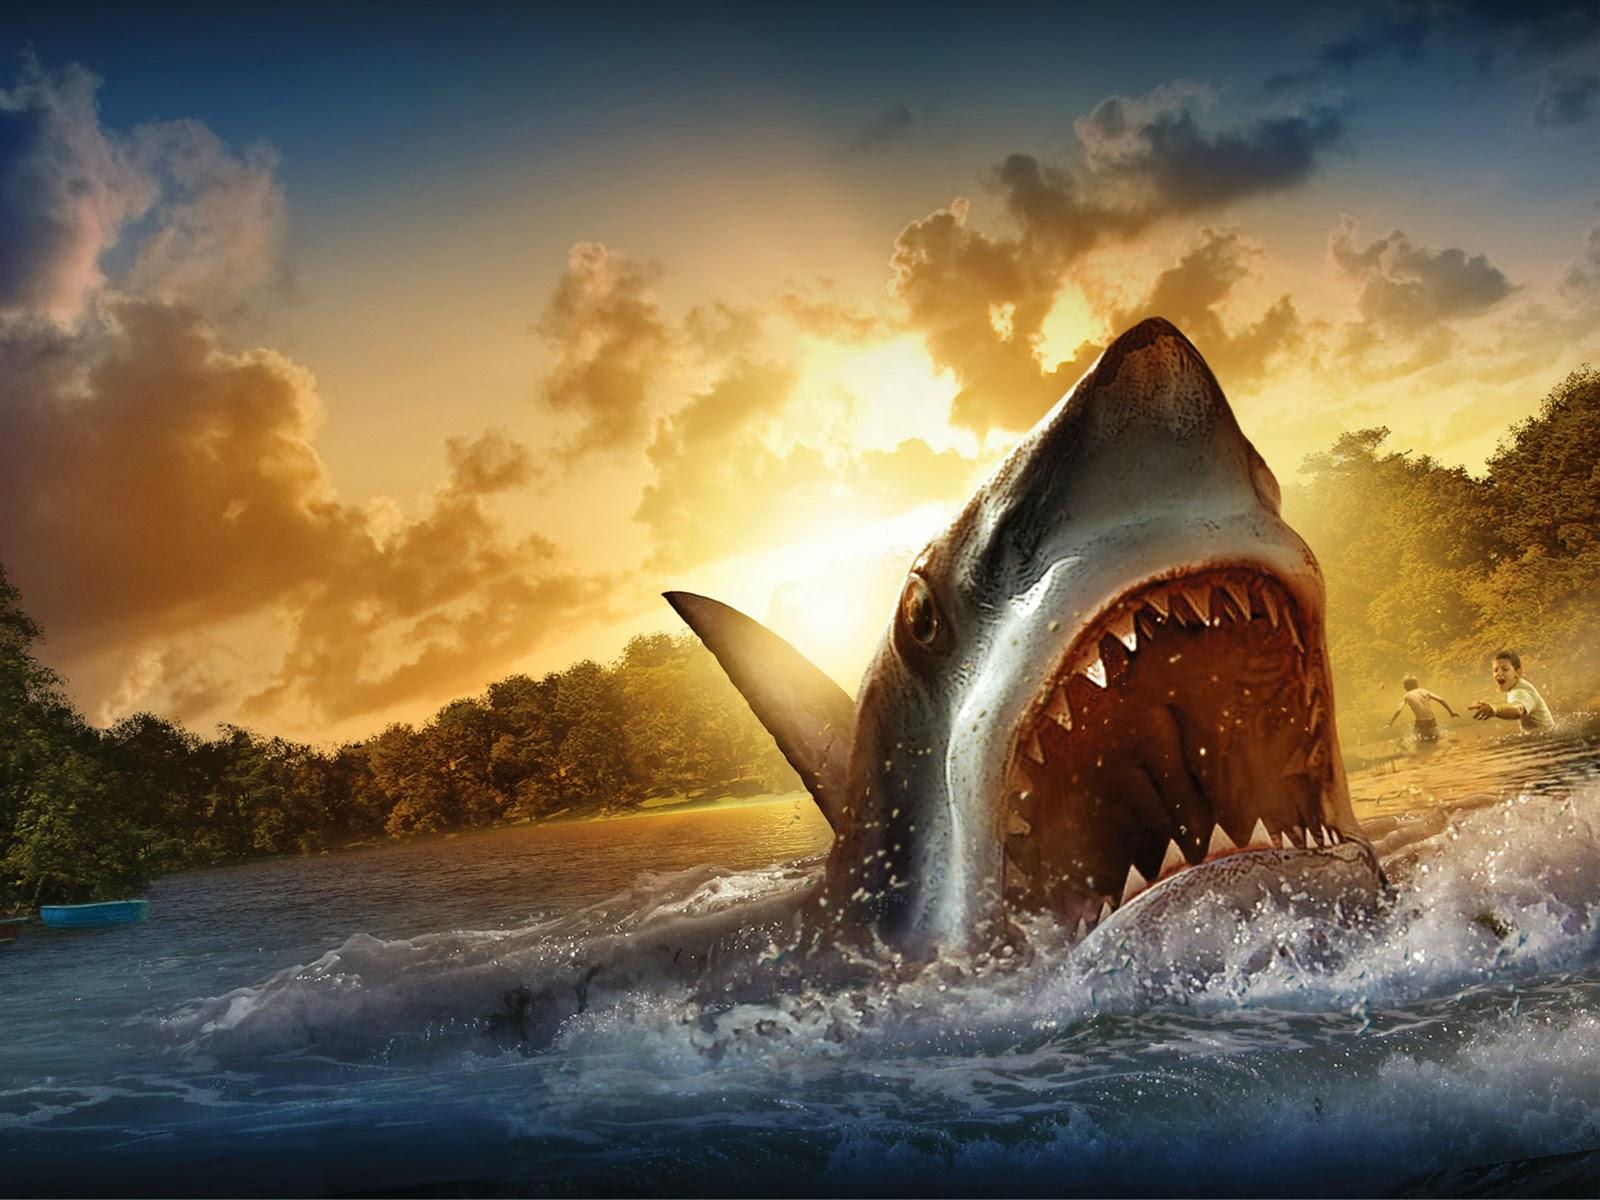 download wallpaper shark 1600 - photo #9